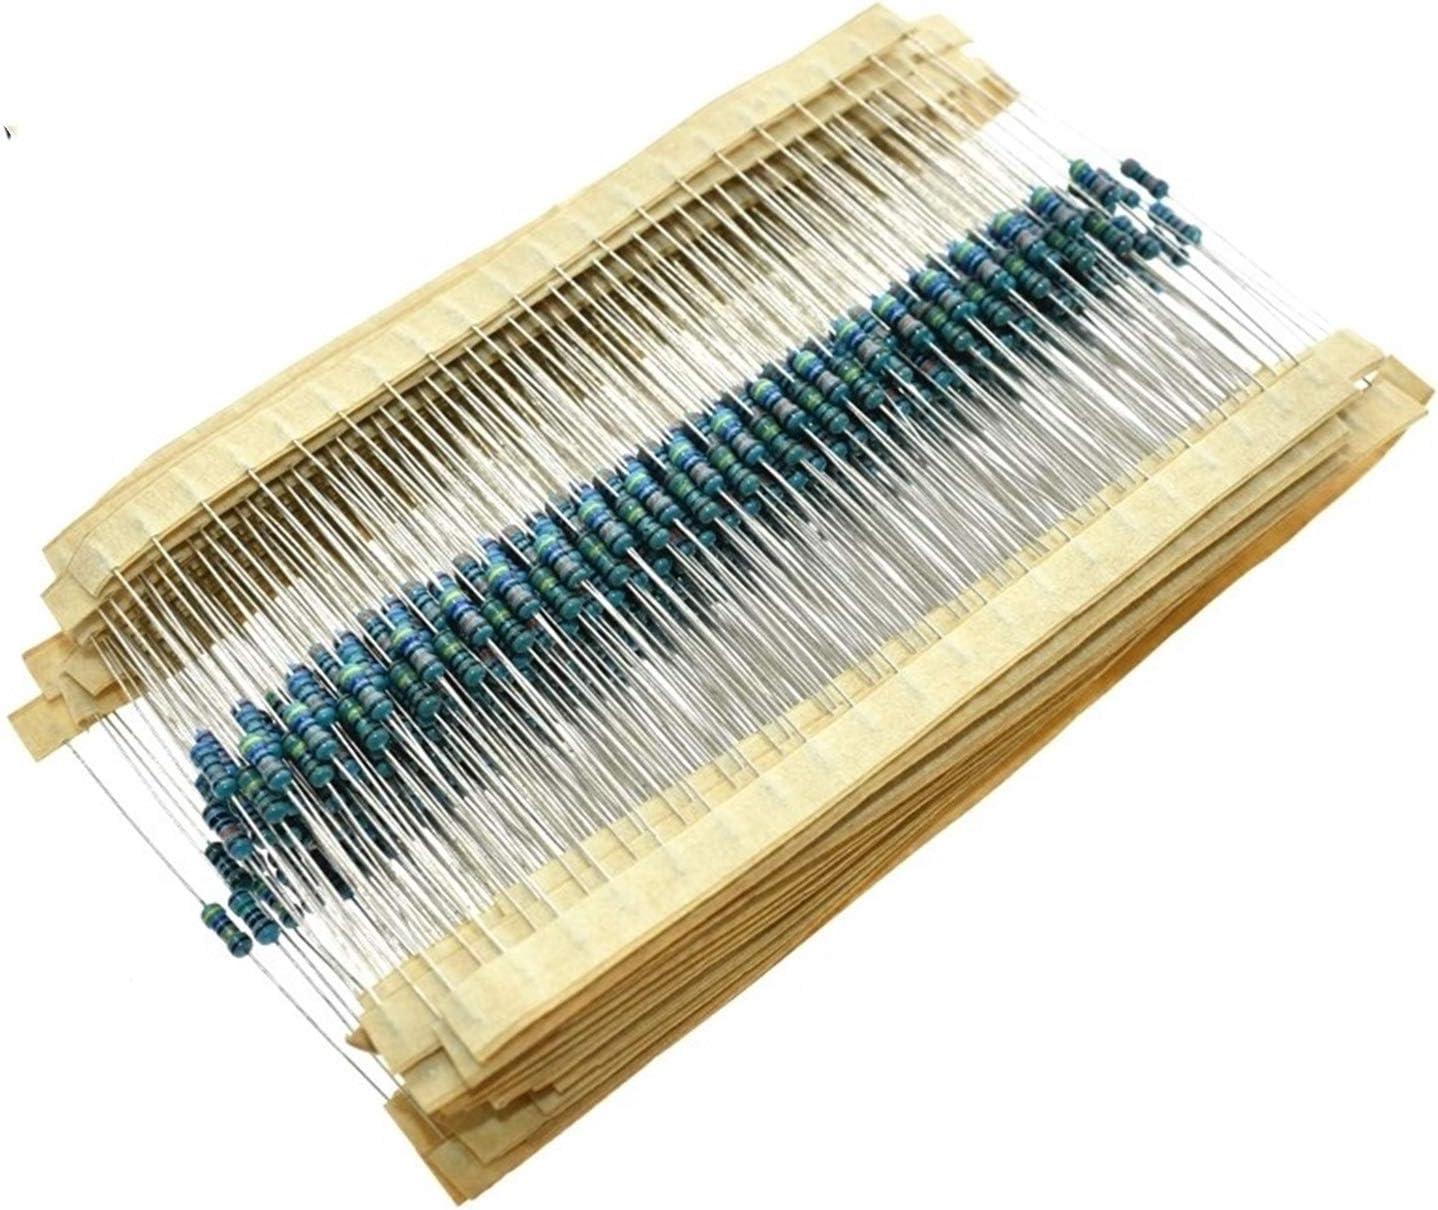 LUBINGMY Resistor 300 600 PCS Set 1 1% Kinds 4W Ea 30 Resistance Very popular Max 78% OFF